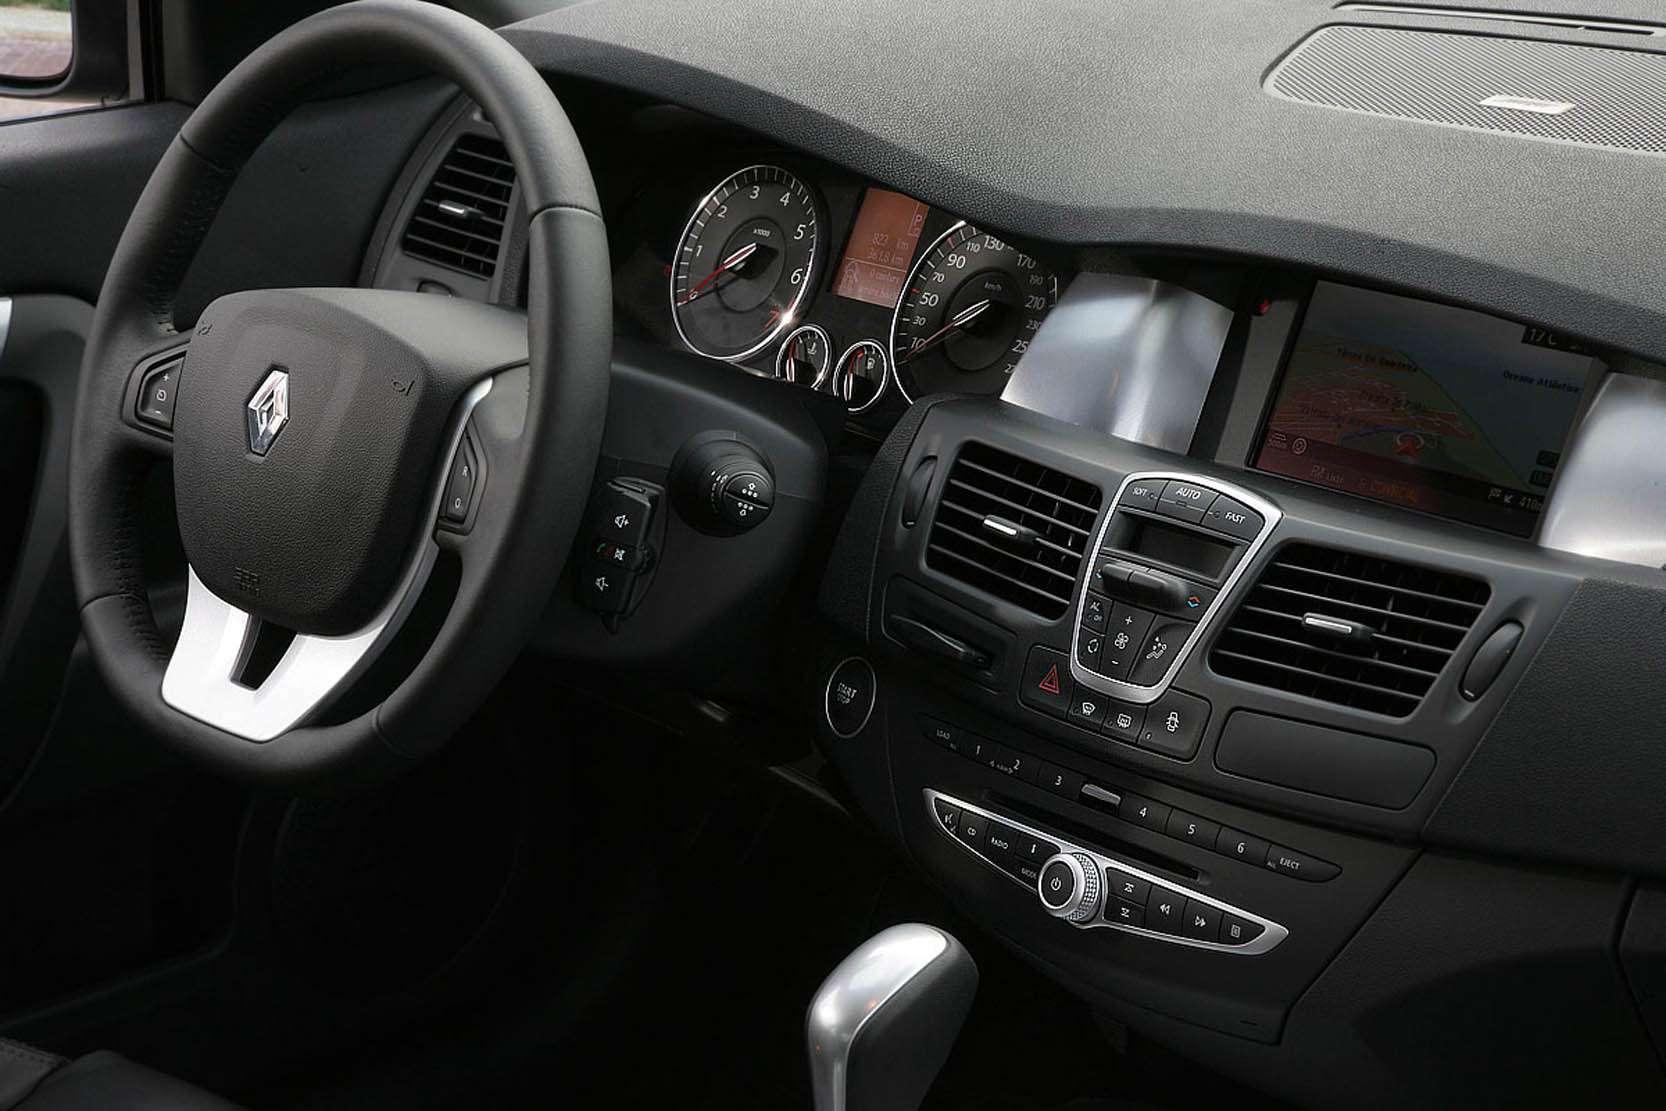 Renault Laguna Coupe Monaco GP Limited Edition | Used Daewoo Cars